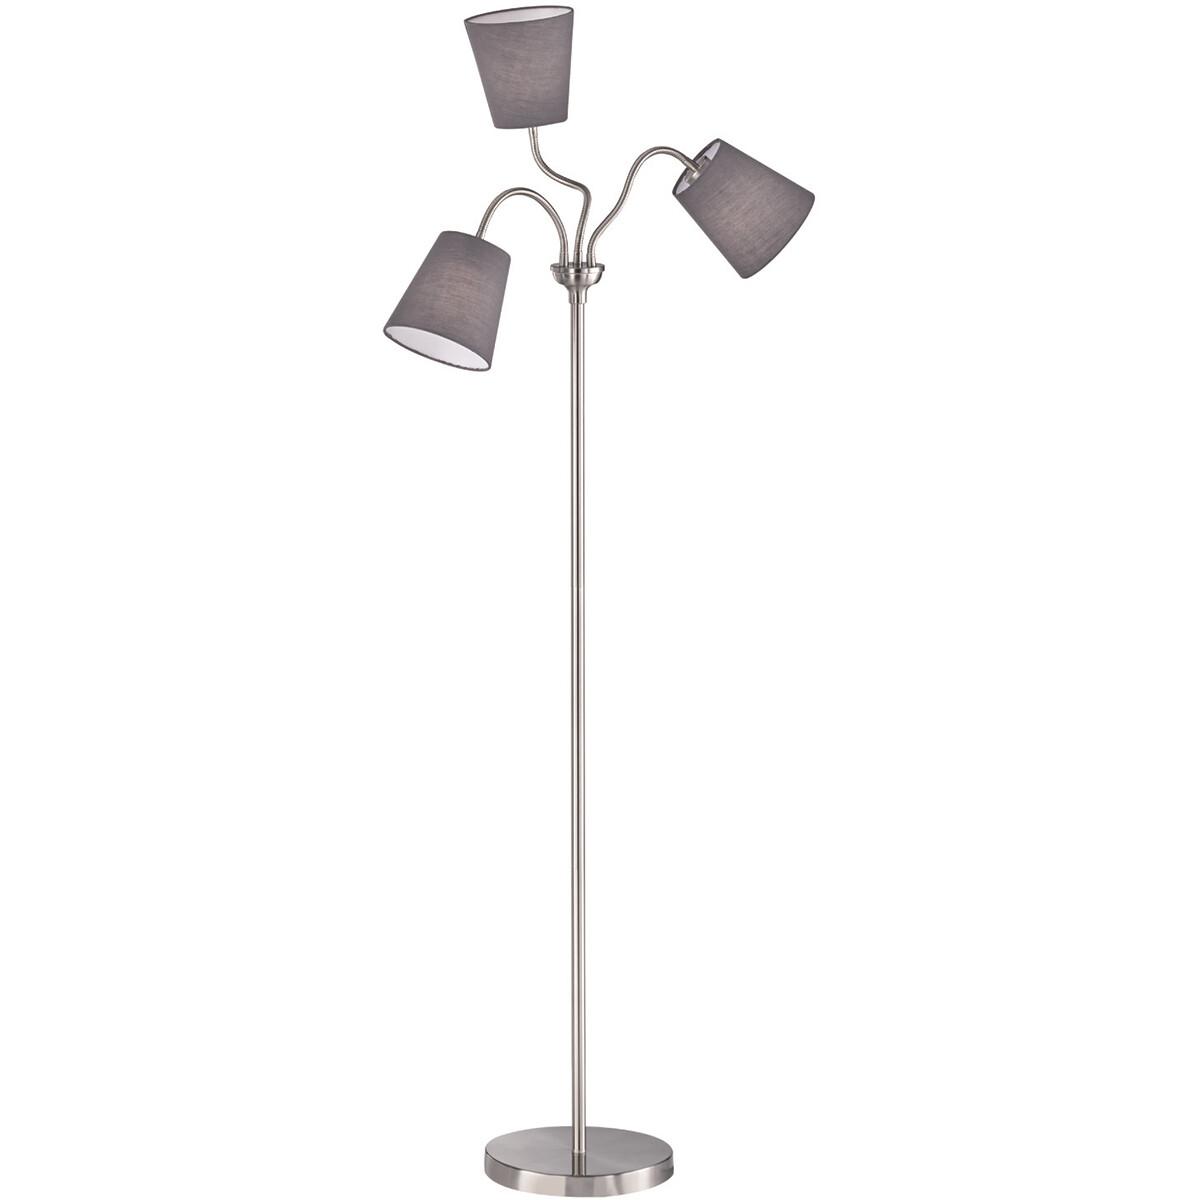 LED Vloerlamp - Trion Winduani - E27 Fitting - 3-lichts - Rond - Mat Grijs - Aluminium